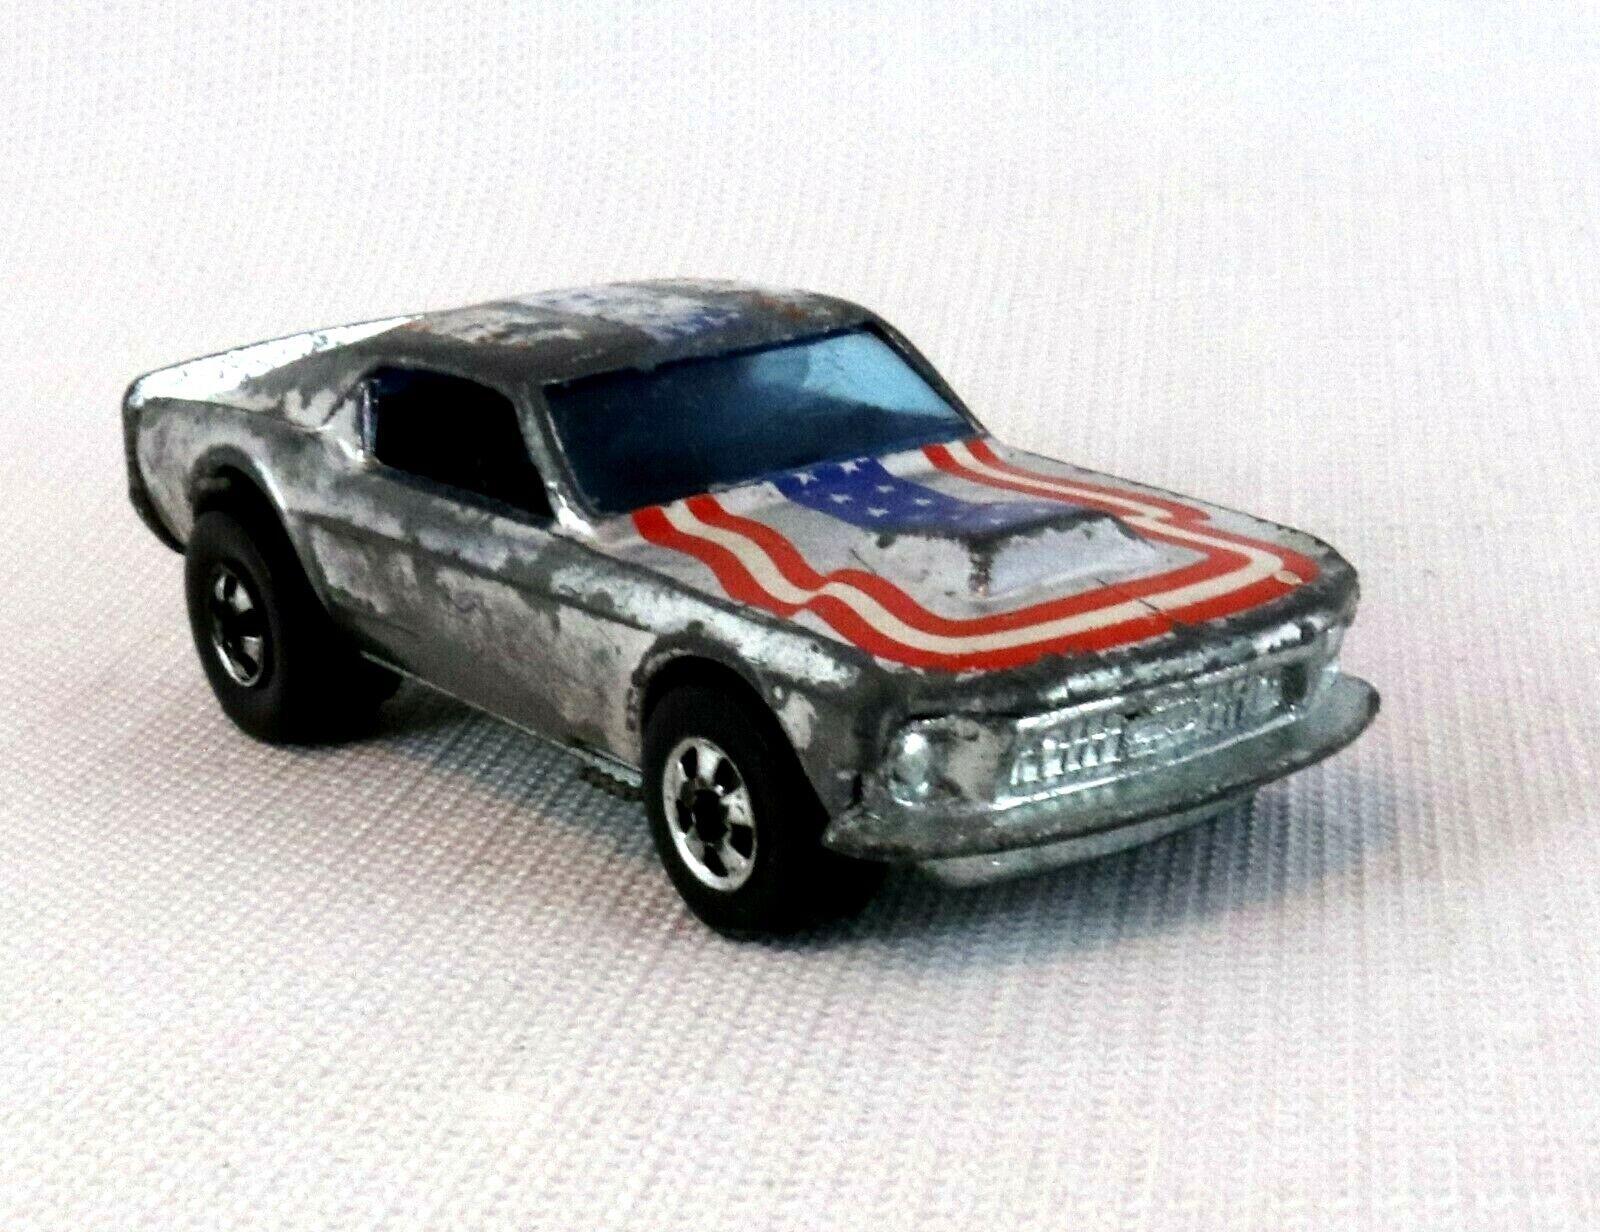 Hot wheels Vintage rotline Mustang stocker Chrome 1974 Hong Kong Diecast Toy Car